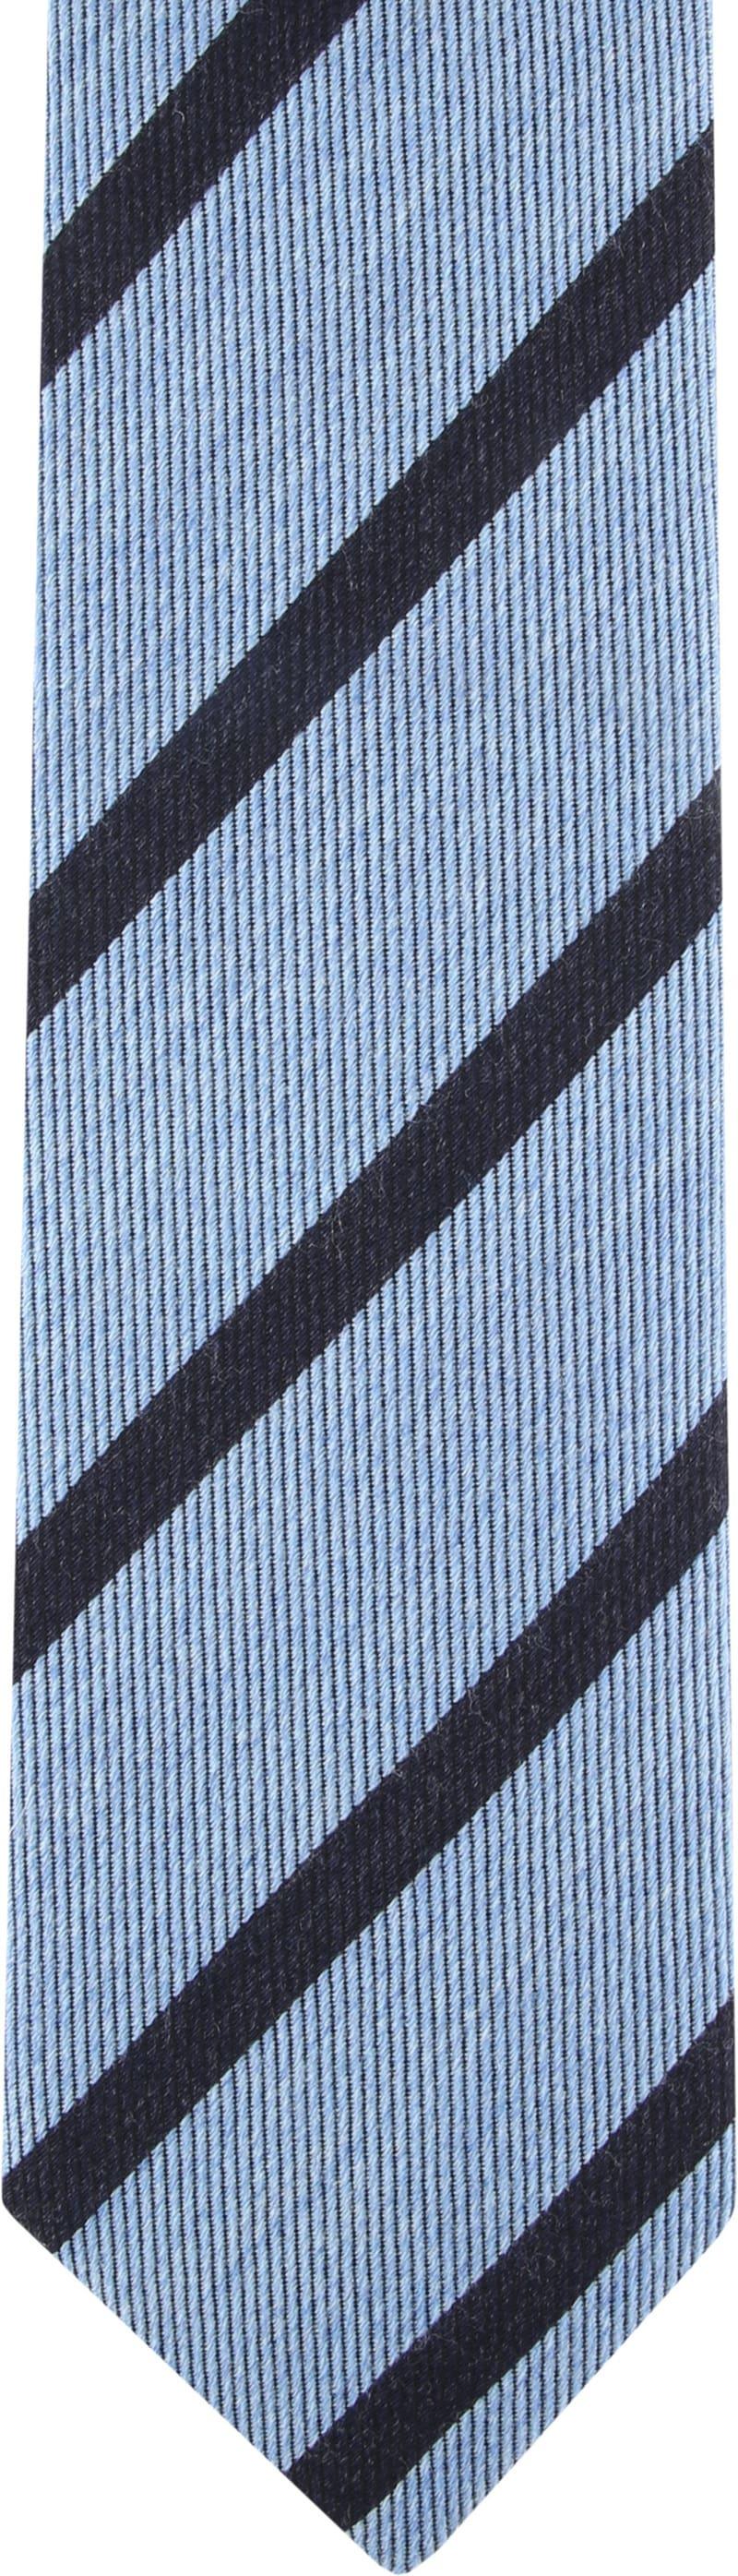 Suitable Krawatte Streifen Hellblau Foto 1